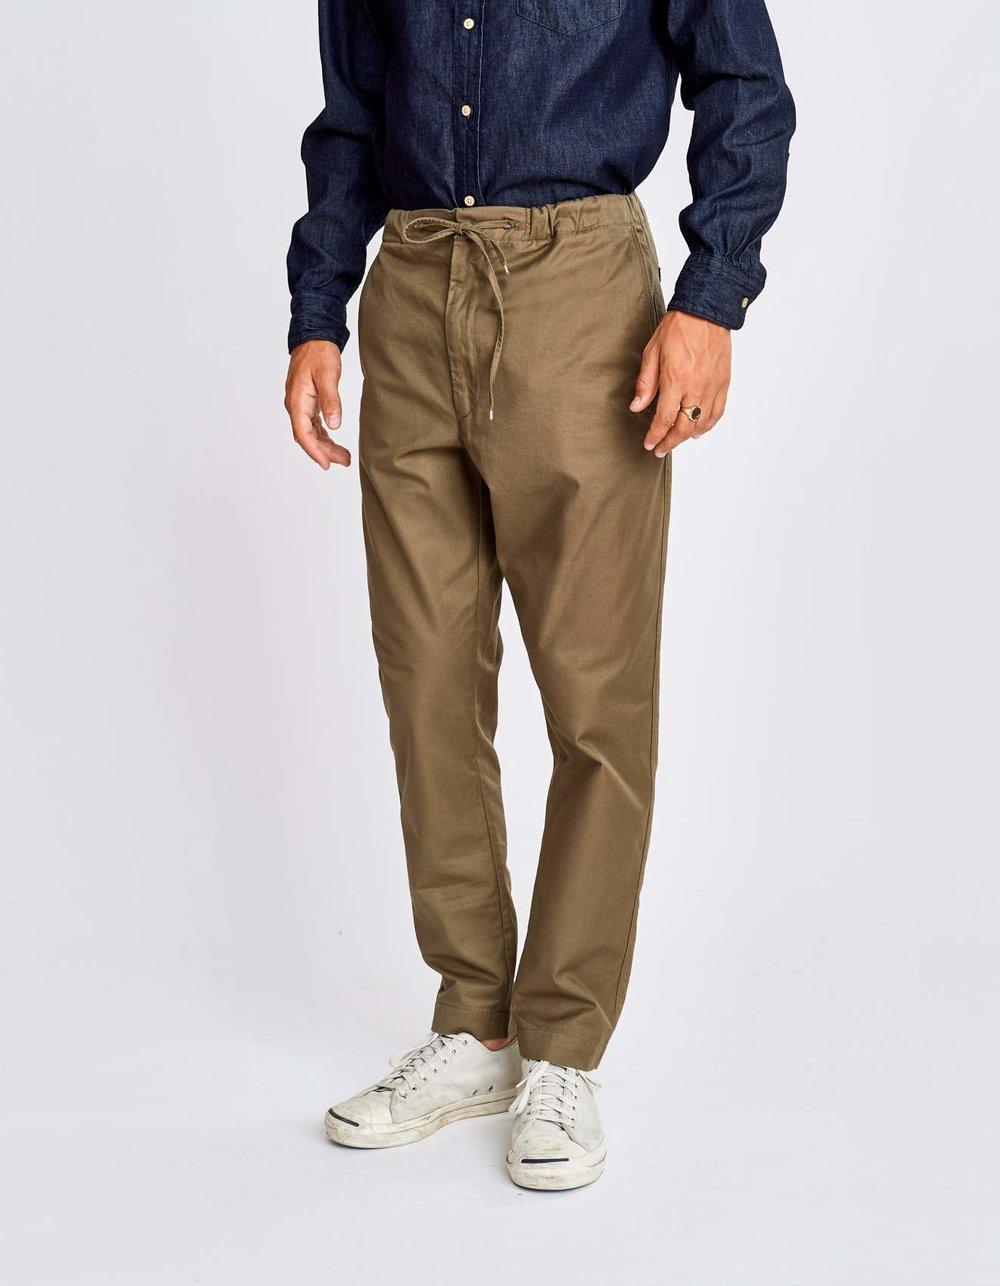 BLR-pants-bm182135p0951-soldier_10.jpg